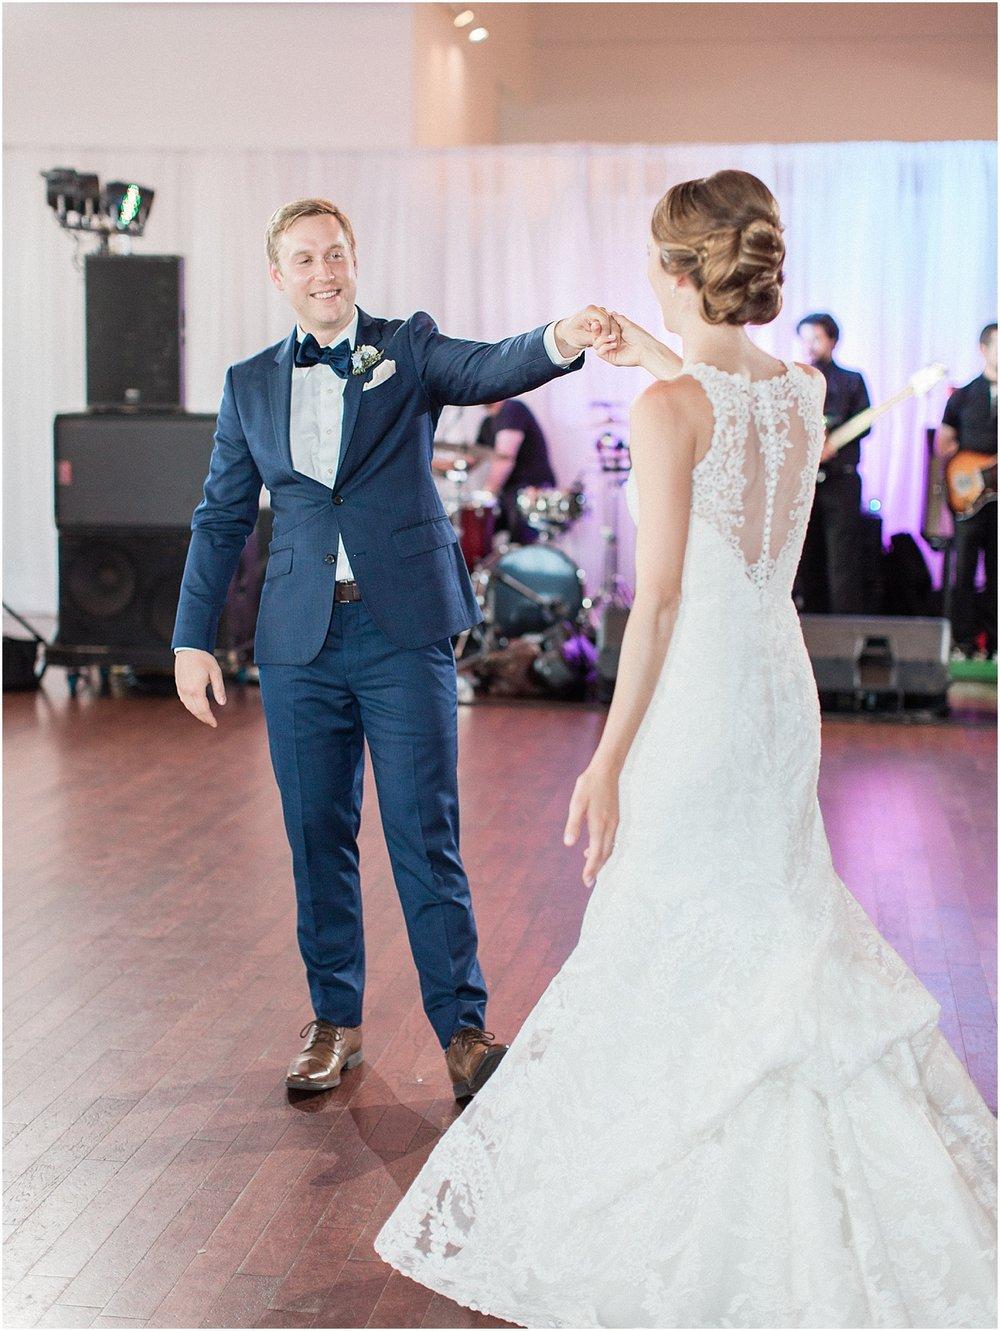 kelly_zach_cruisport_gloucester_ma_bass_rocks_cape_cod_boston_wedding_photographer_meredith_jane_photography_photo_0695.jpg